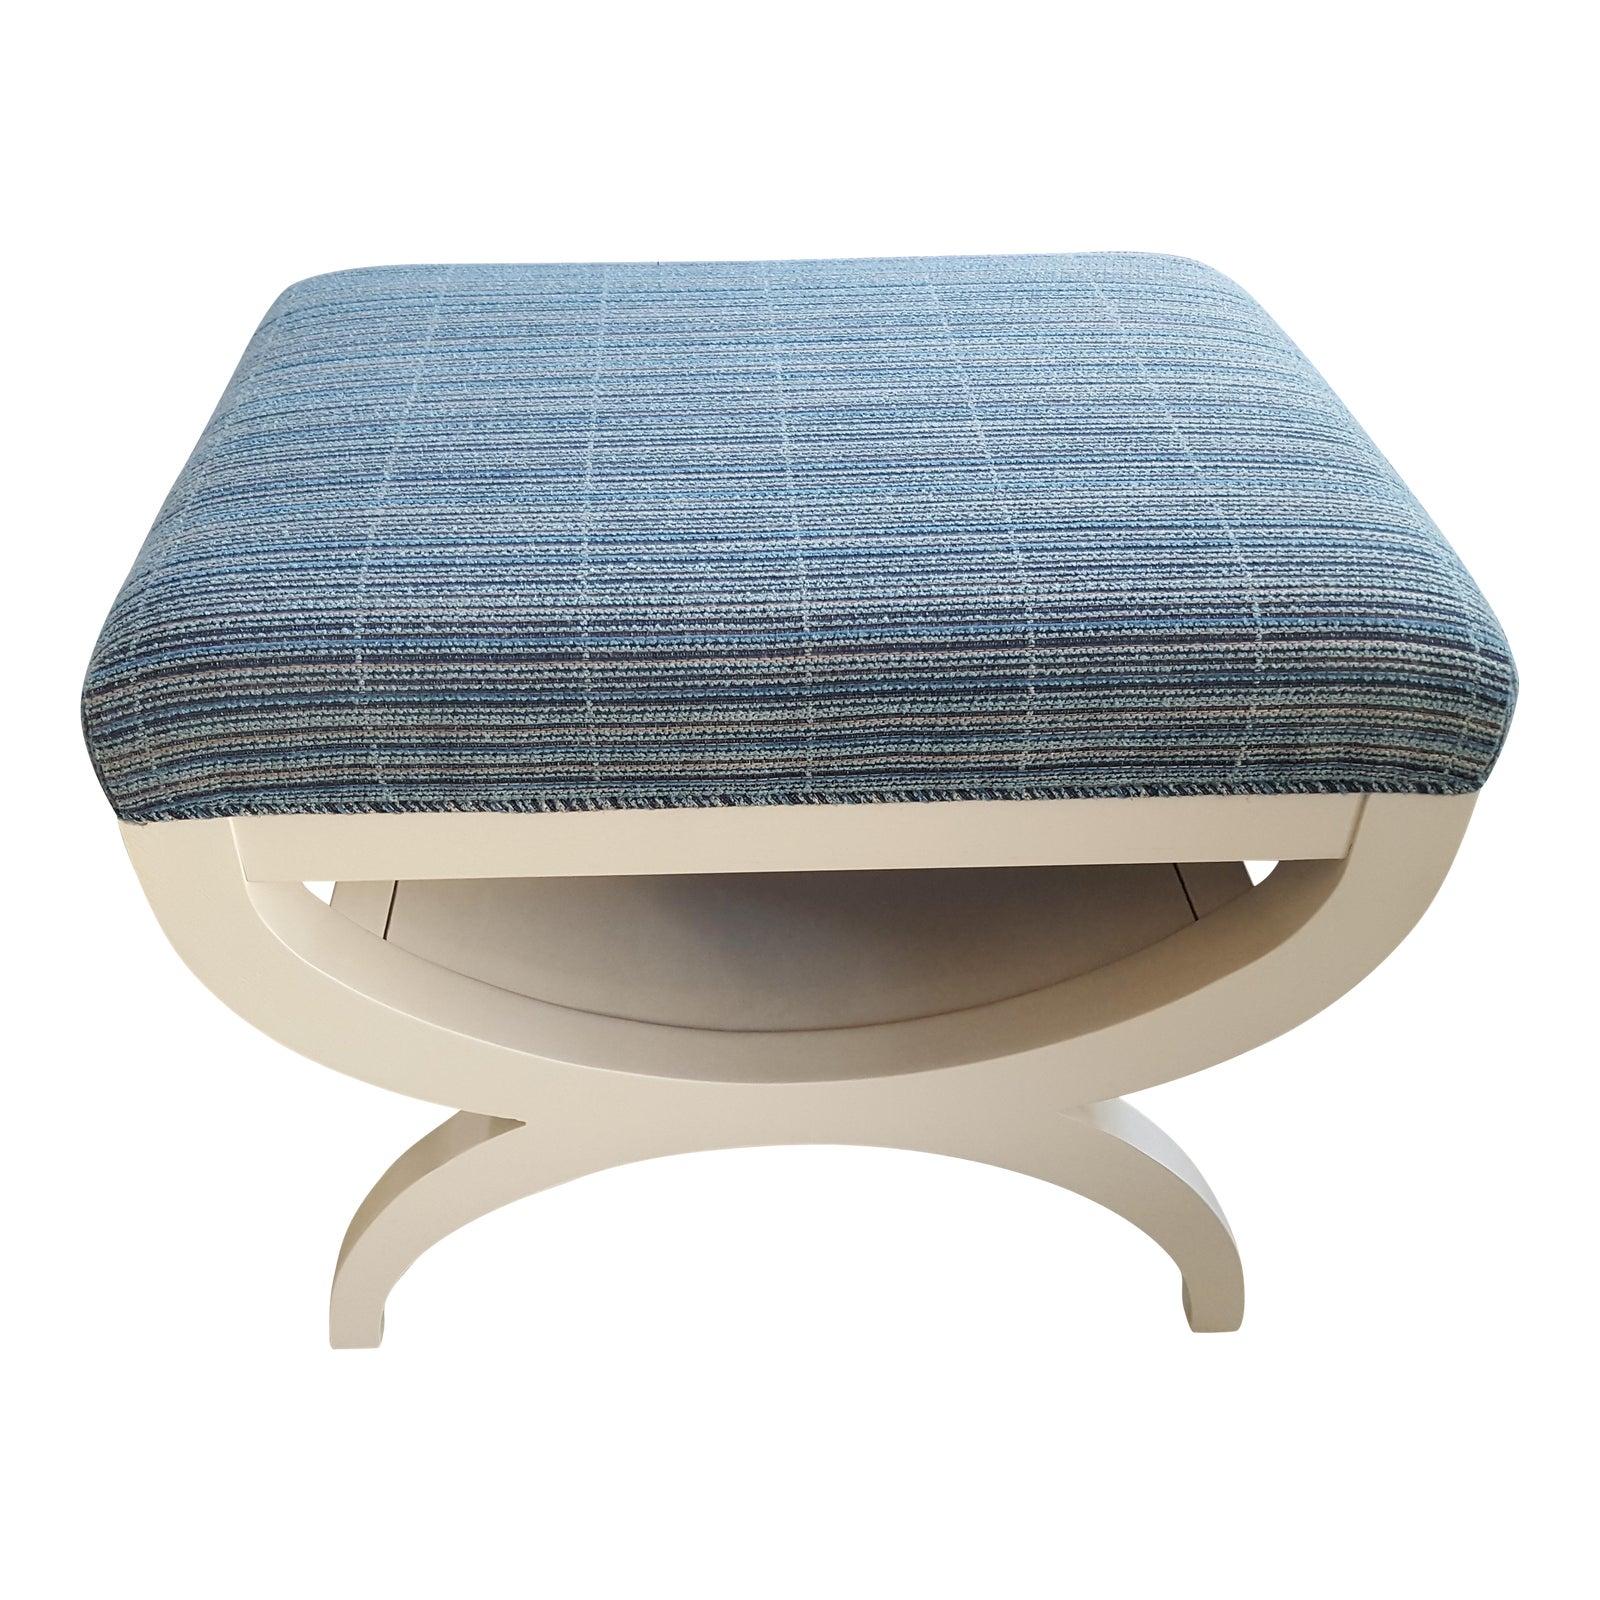 Fine Vanguard Furniture Burrel Ottoman Ibusinesslaw Wood Chair Design Ideas Ibusinesslaworg